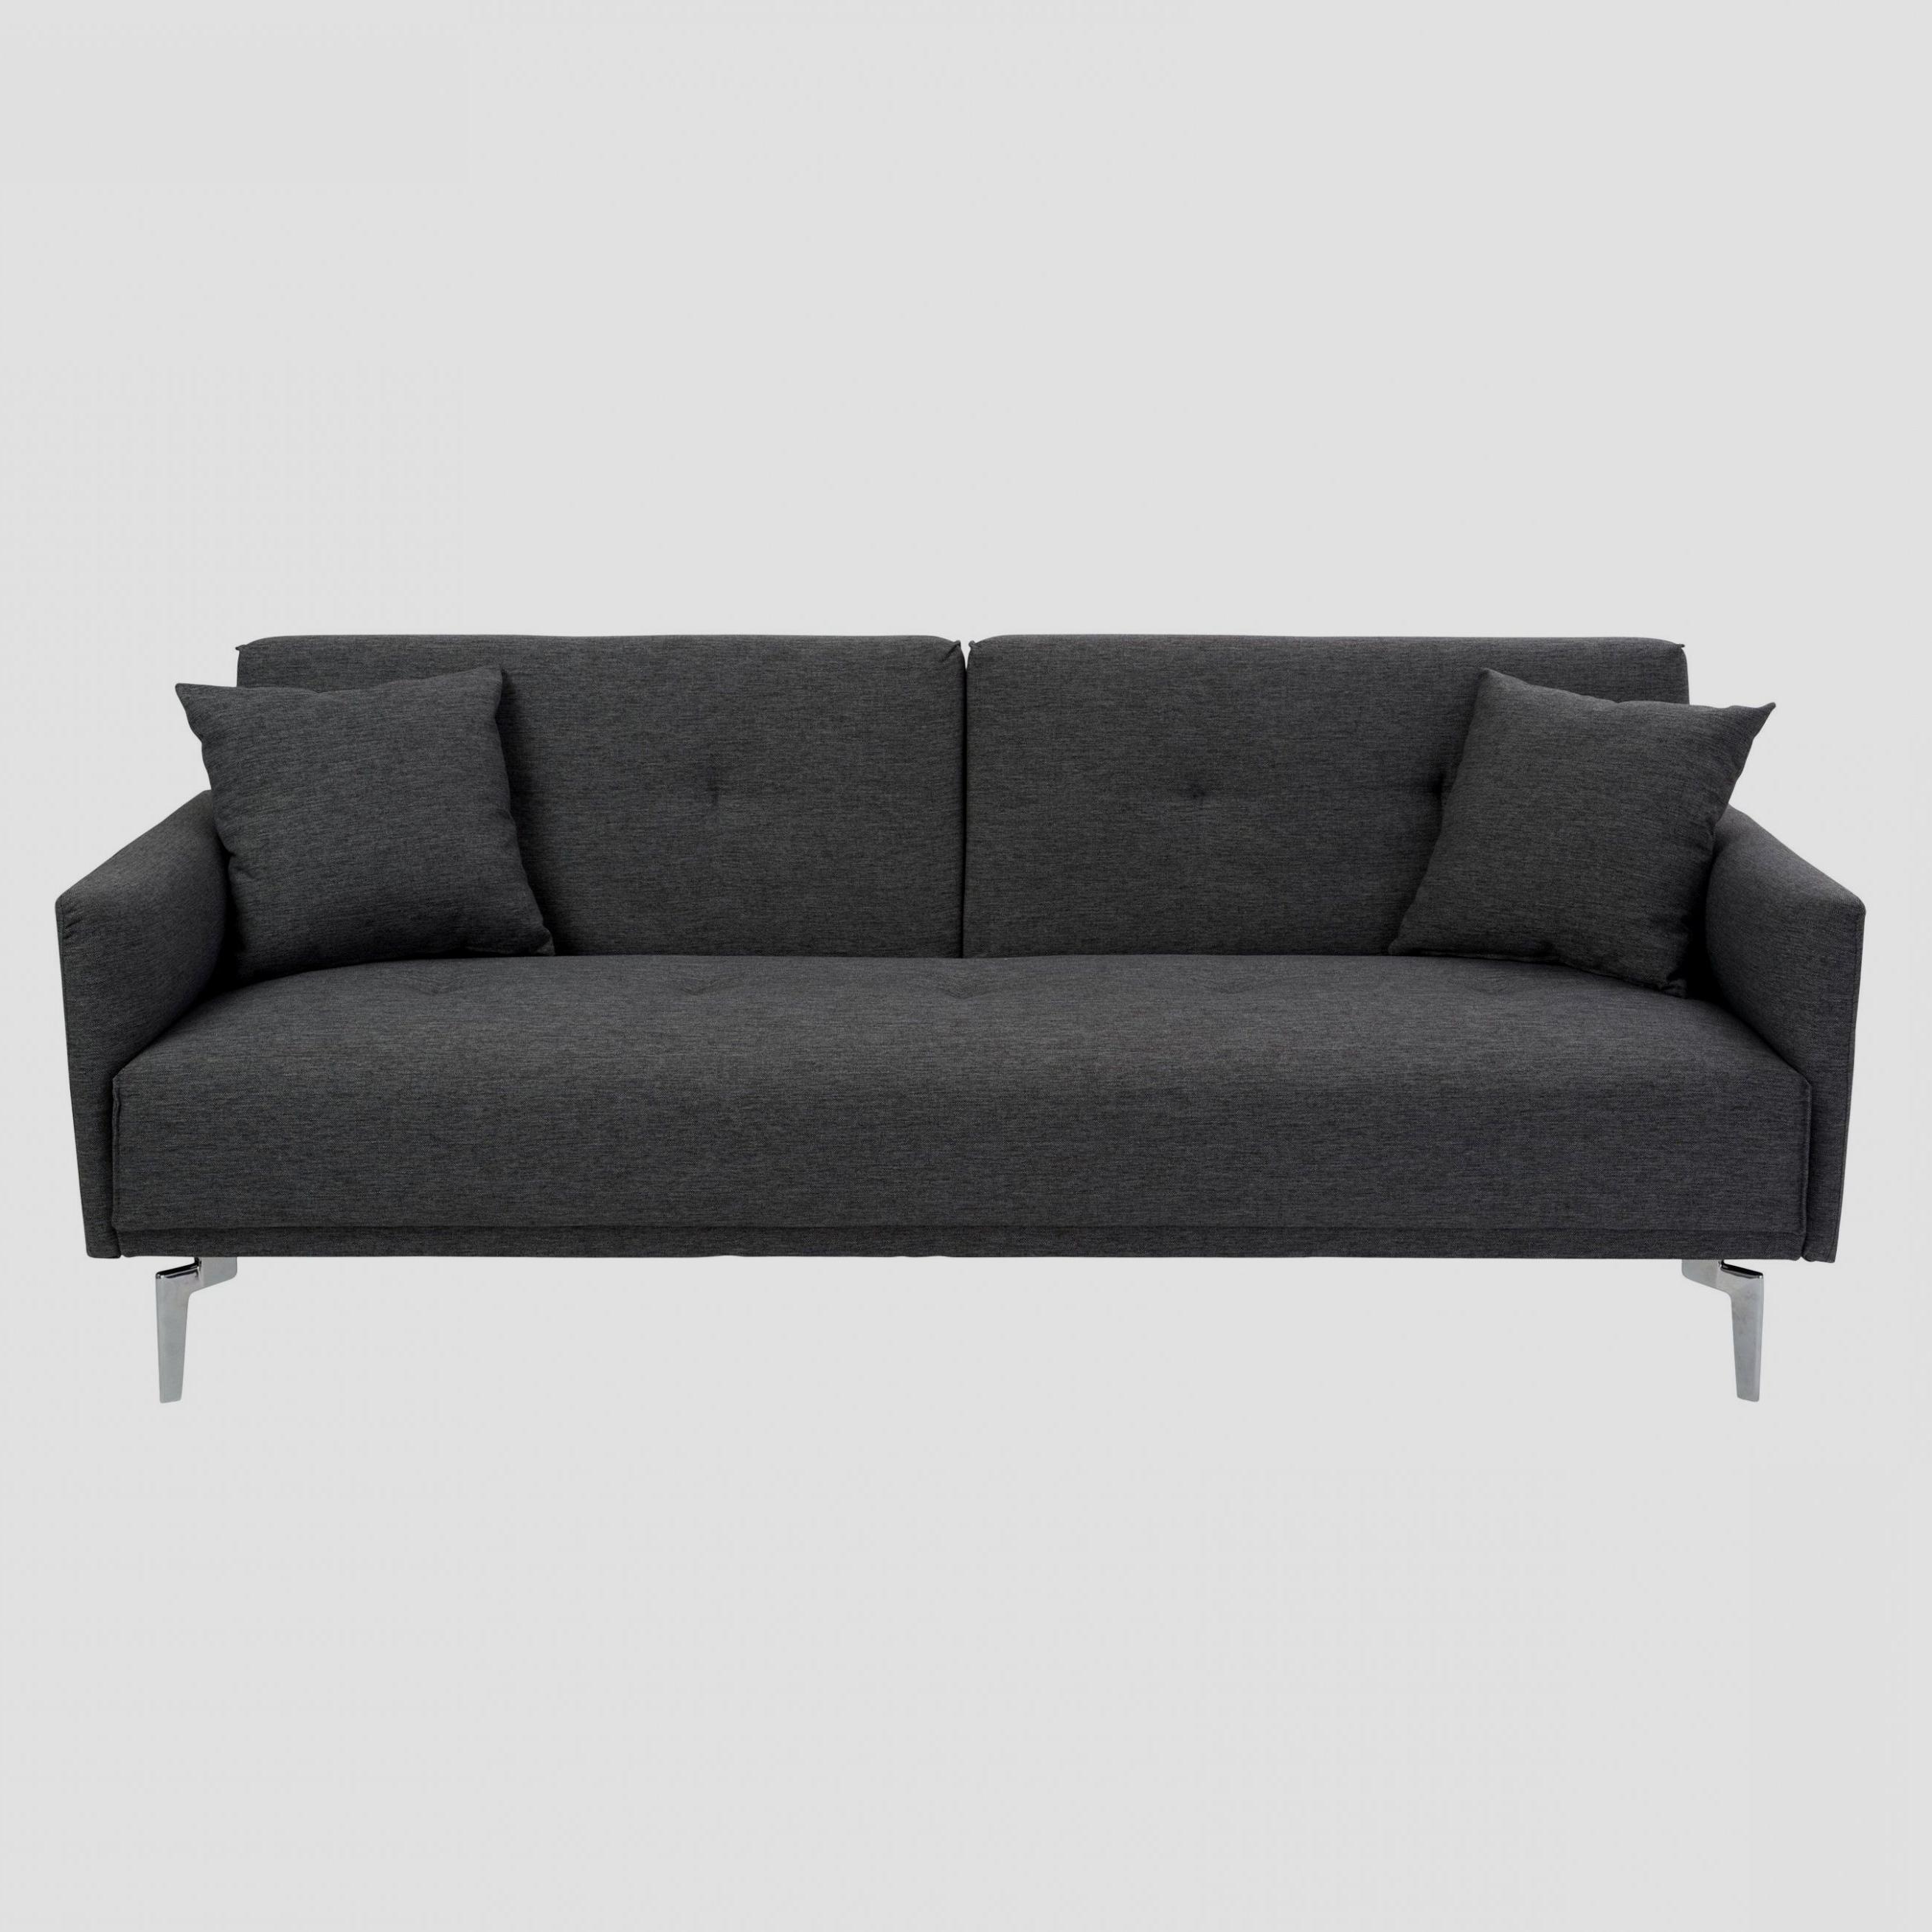 Sofa Curvo Tqd3 sofa Curvo Bello Lafau sofa Bed with Armrest Dark Gray